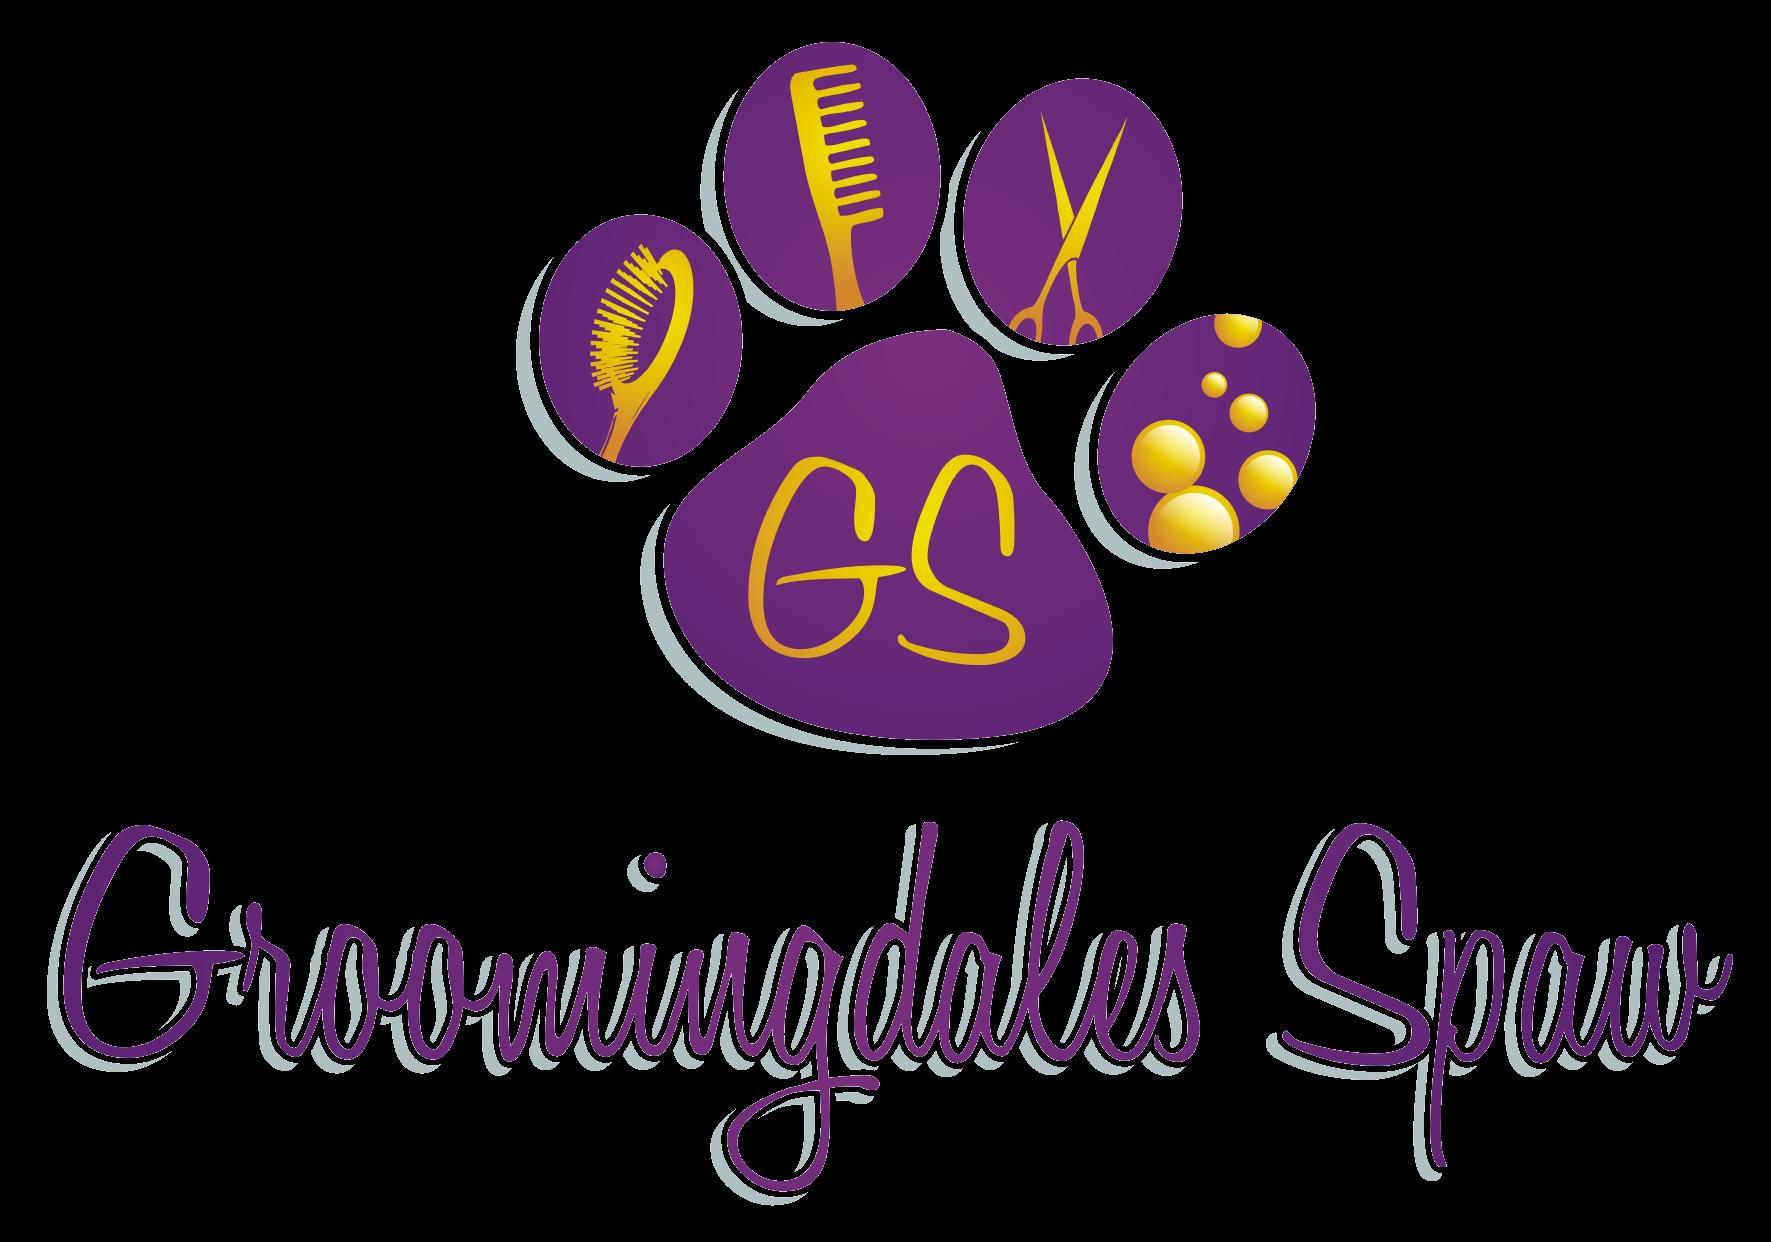 groomingdalesspaw.com